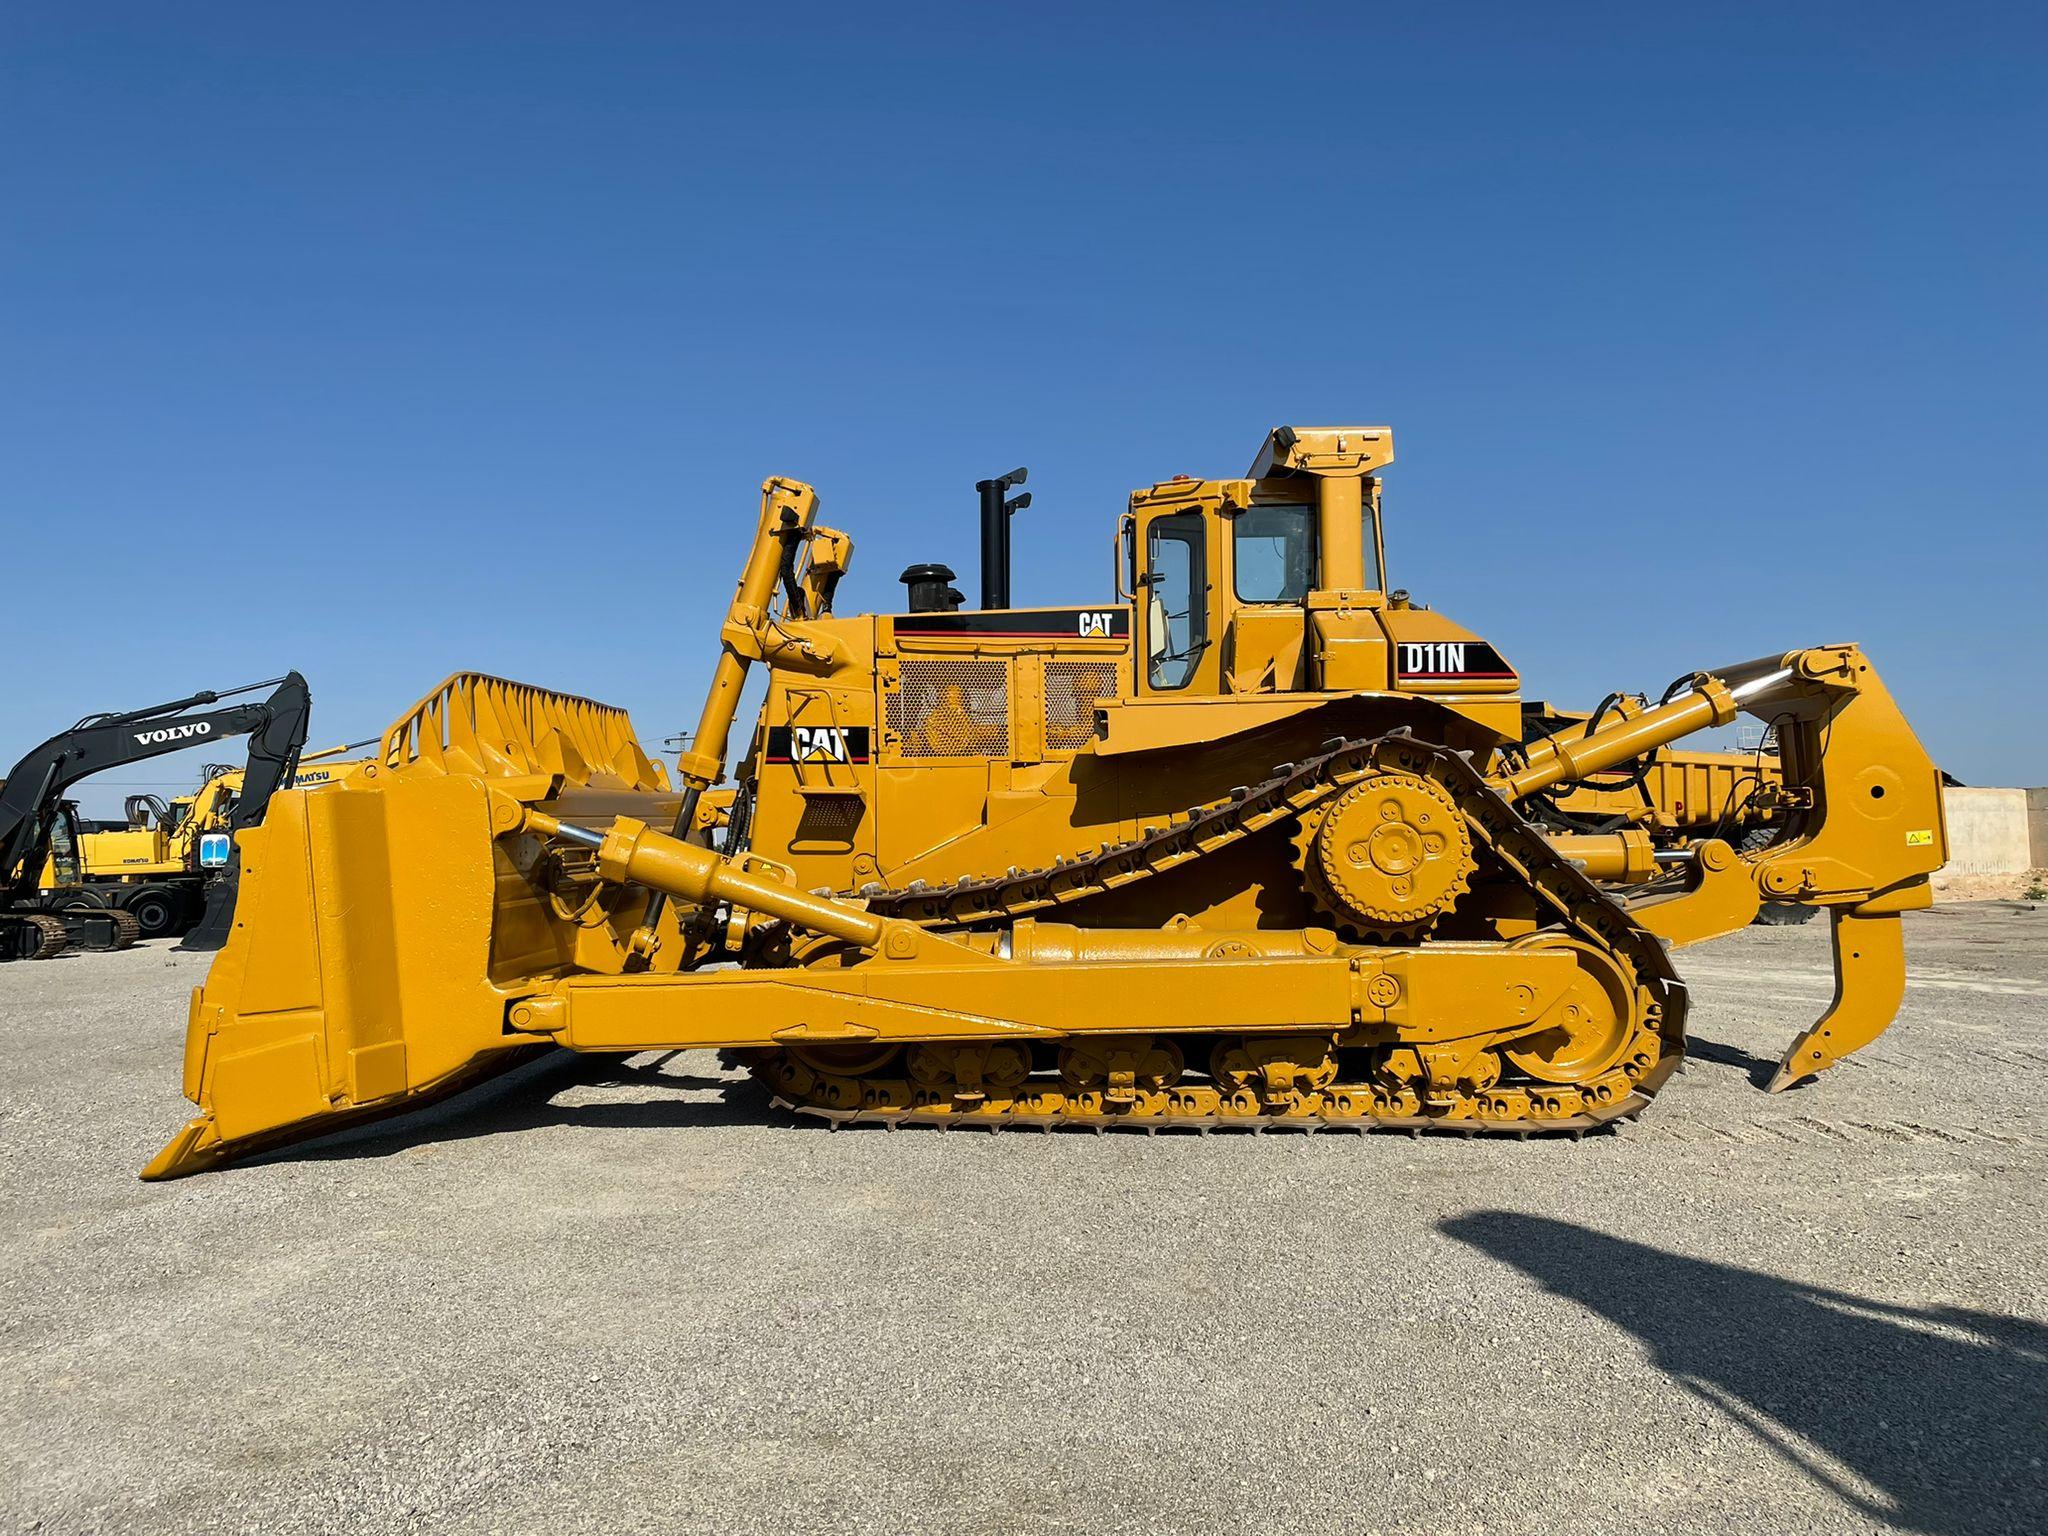 1994-caterpillar-d11n-equipment-cover-image